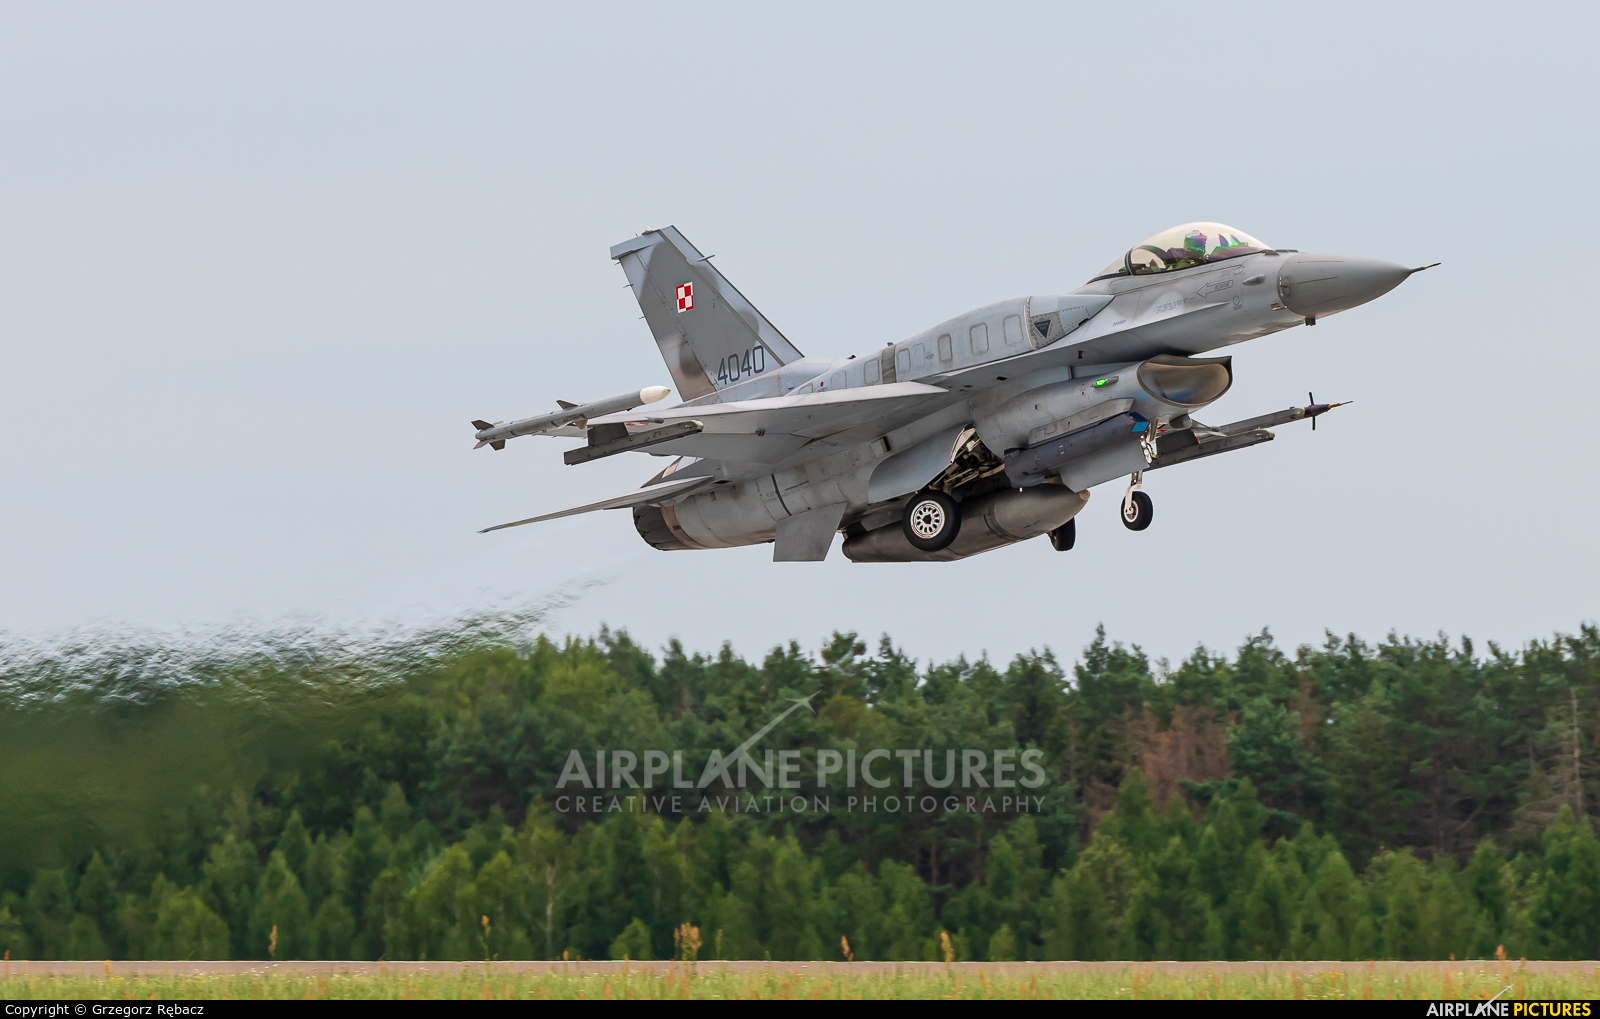 Poland - Air Force 4040 aircraft at Łask AB